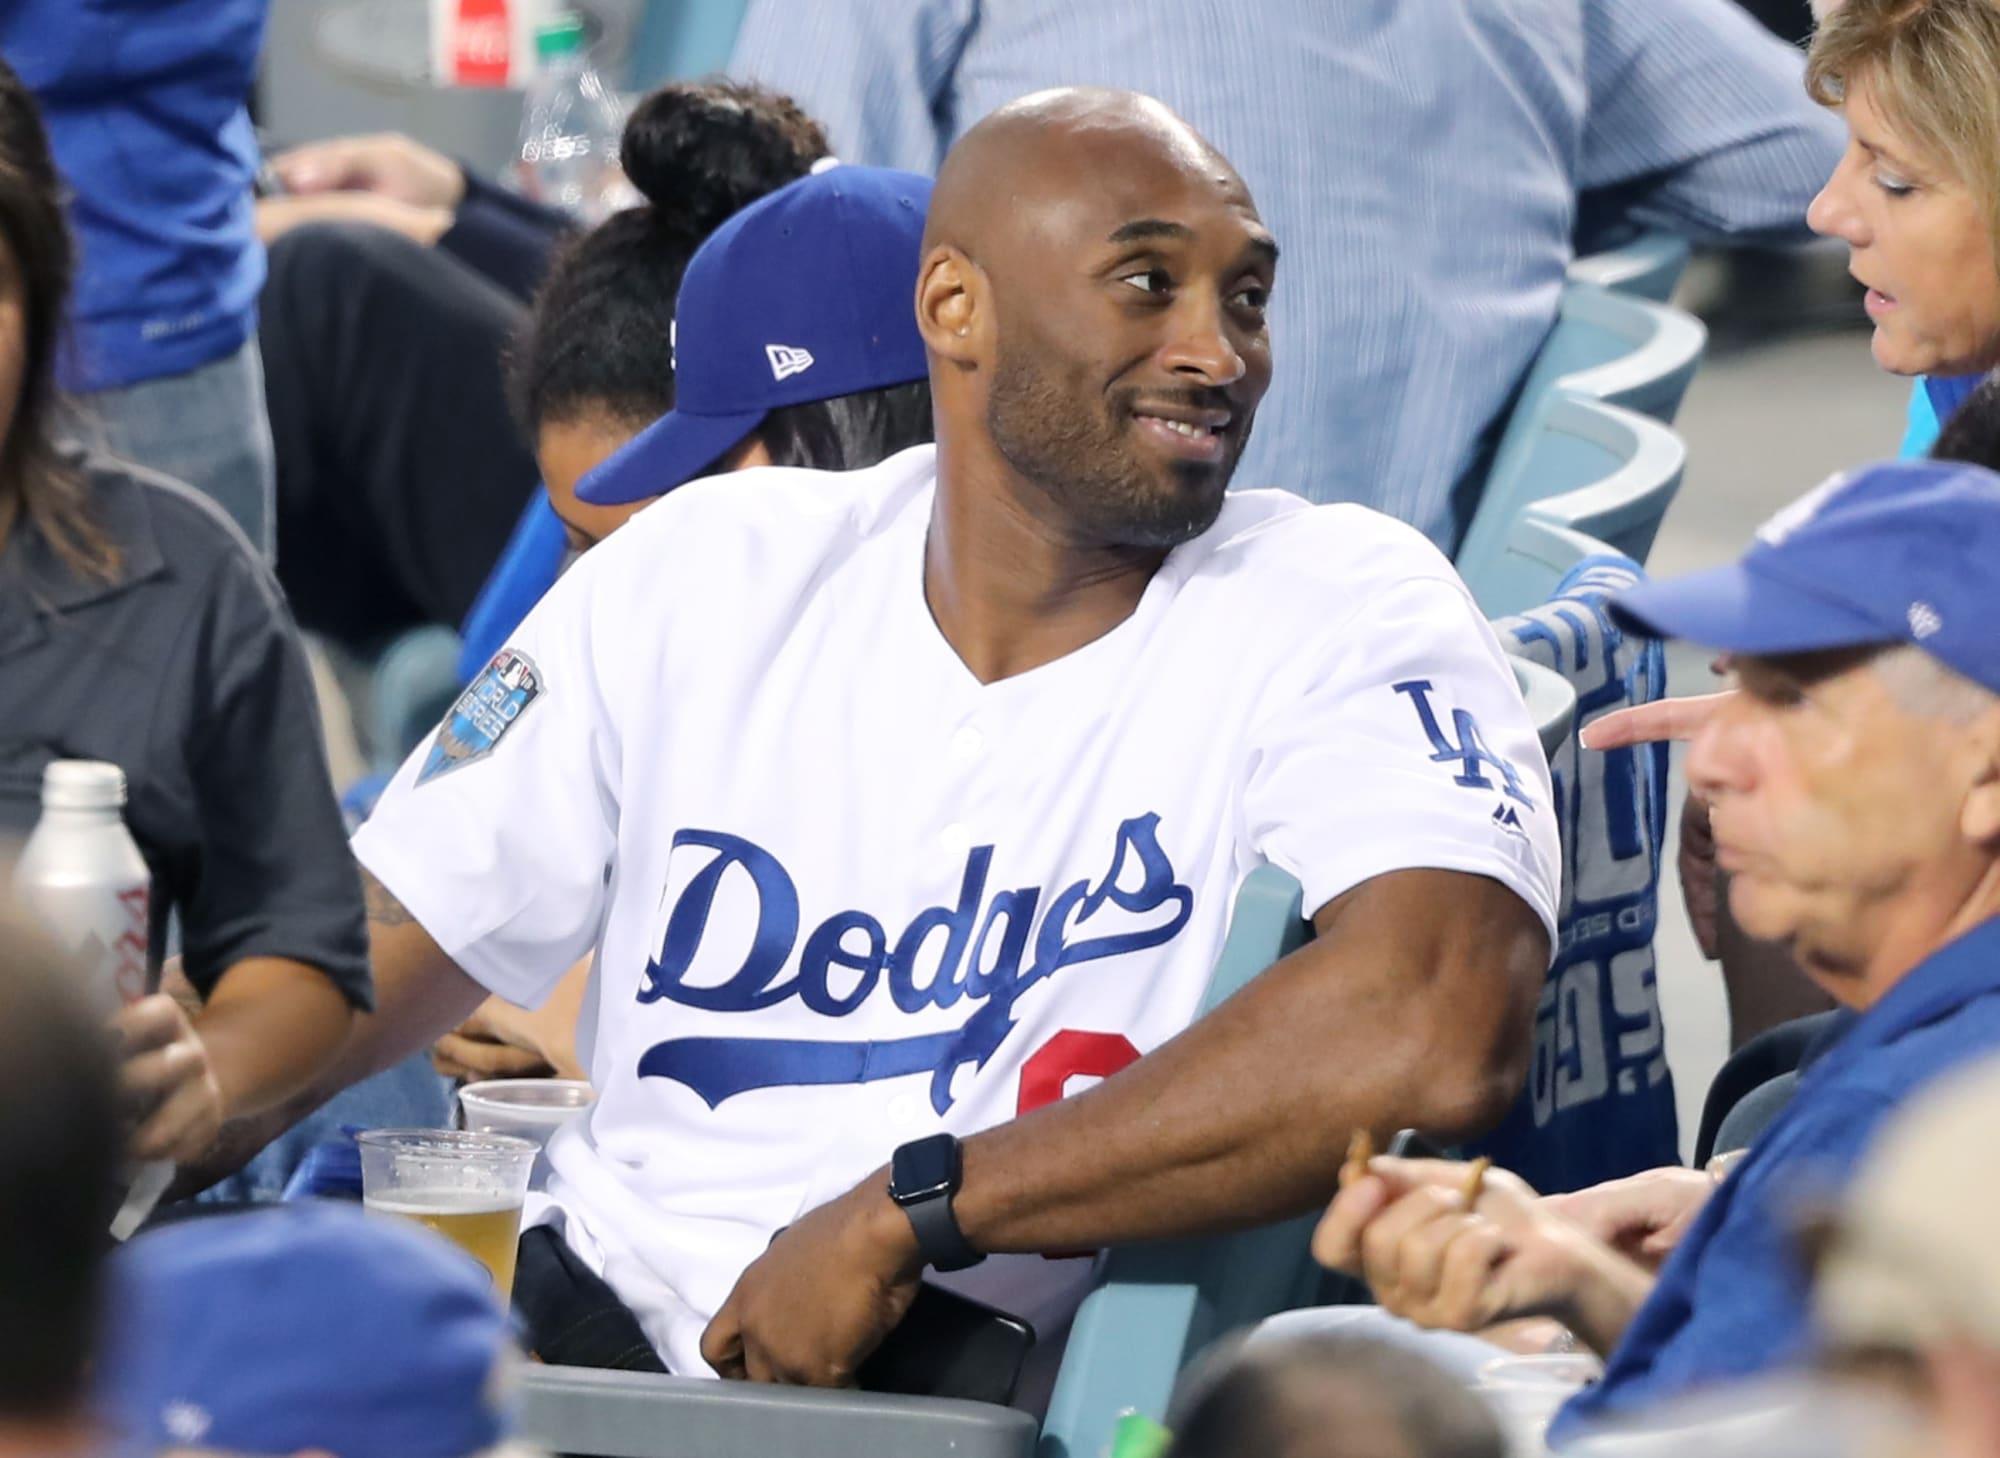 Dodgers' Kobe Bryant tribute on anniversary of tragedy was amazing